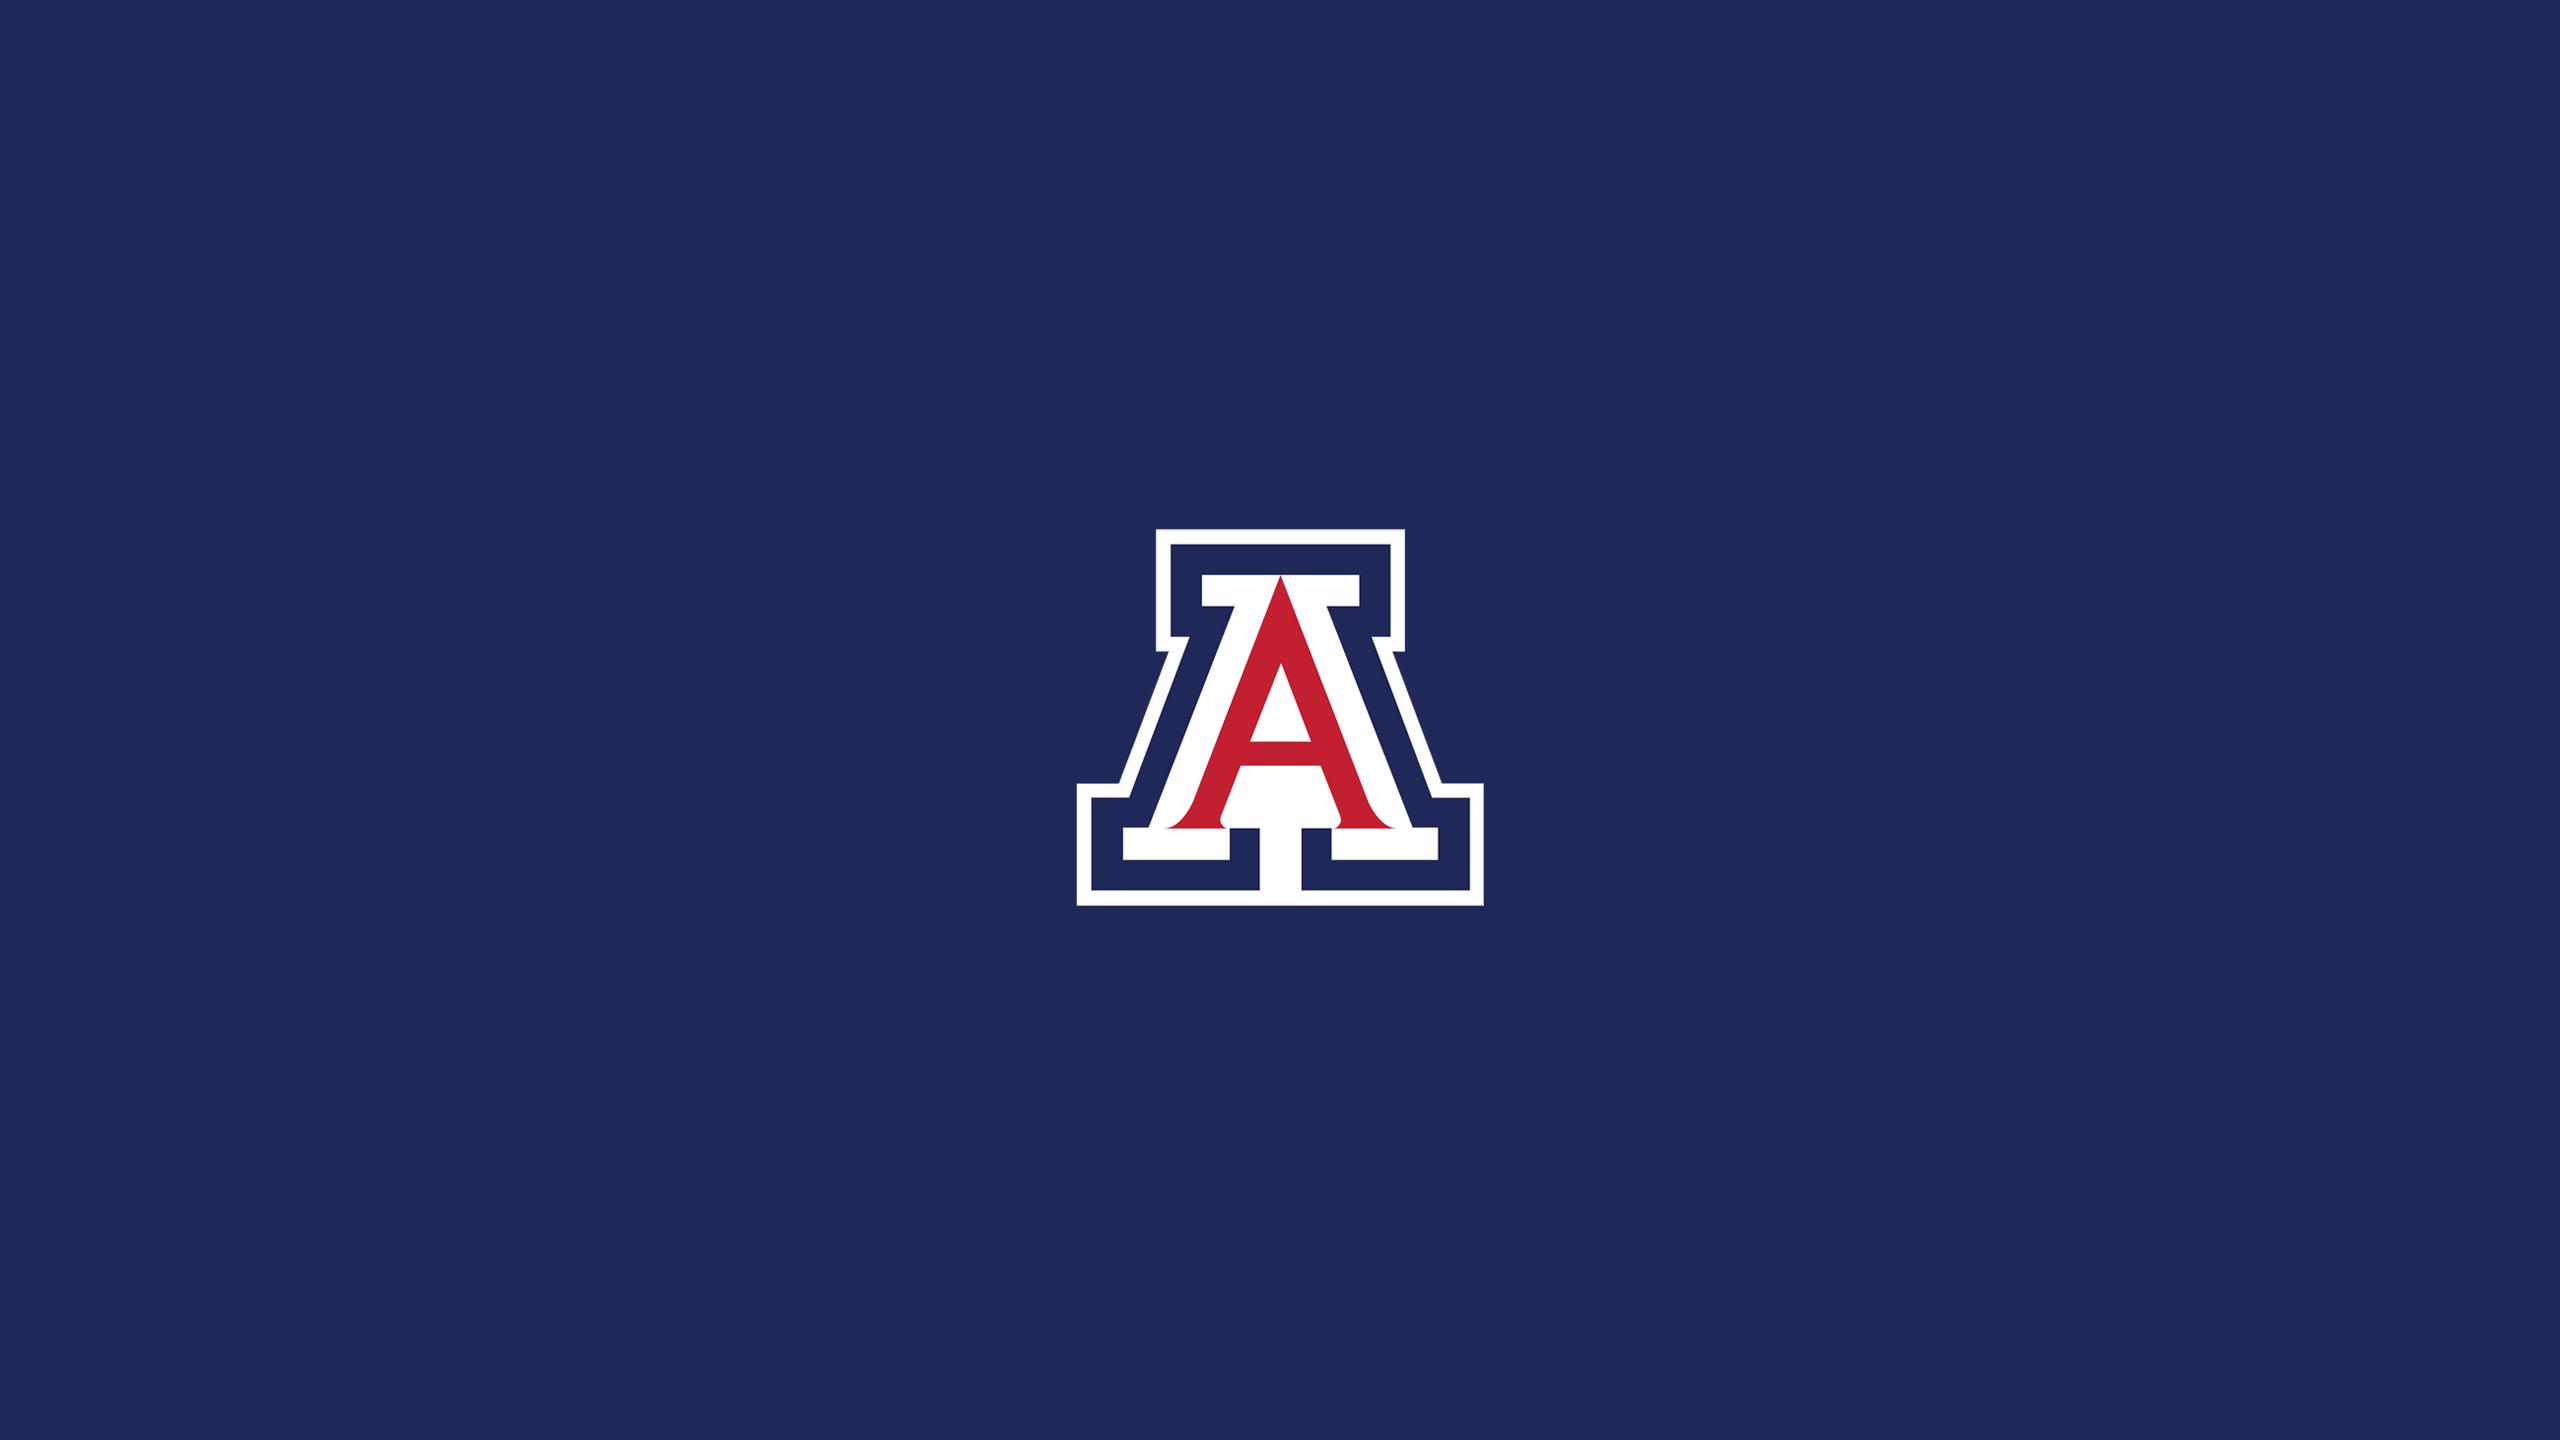 University Of Arizona Wallpapers Top Free University Of